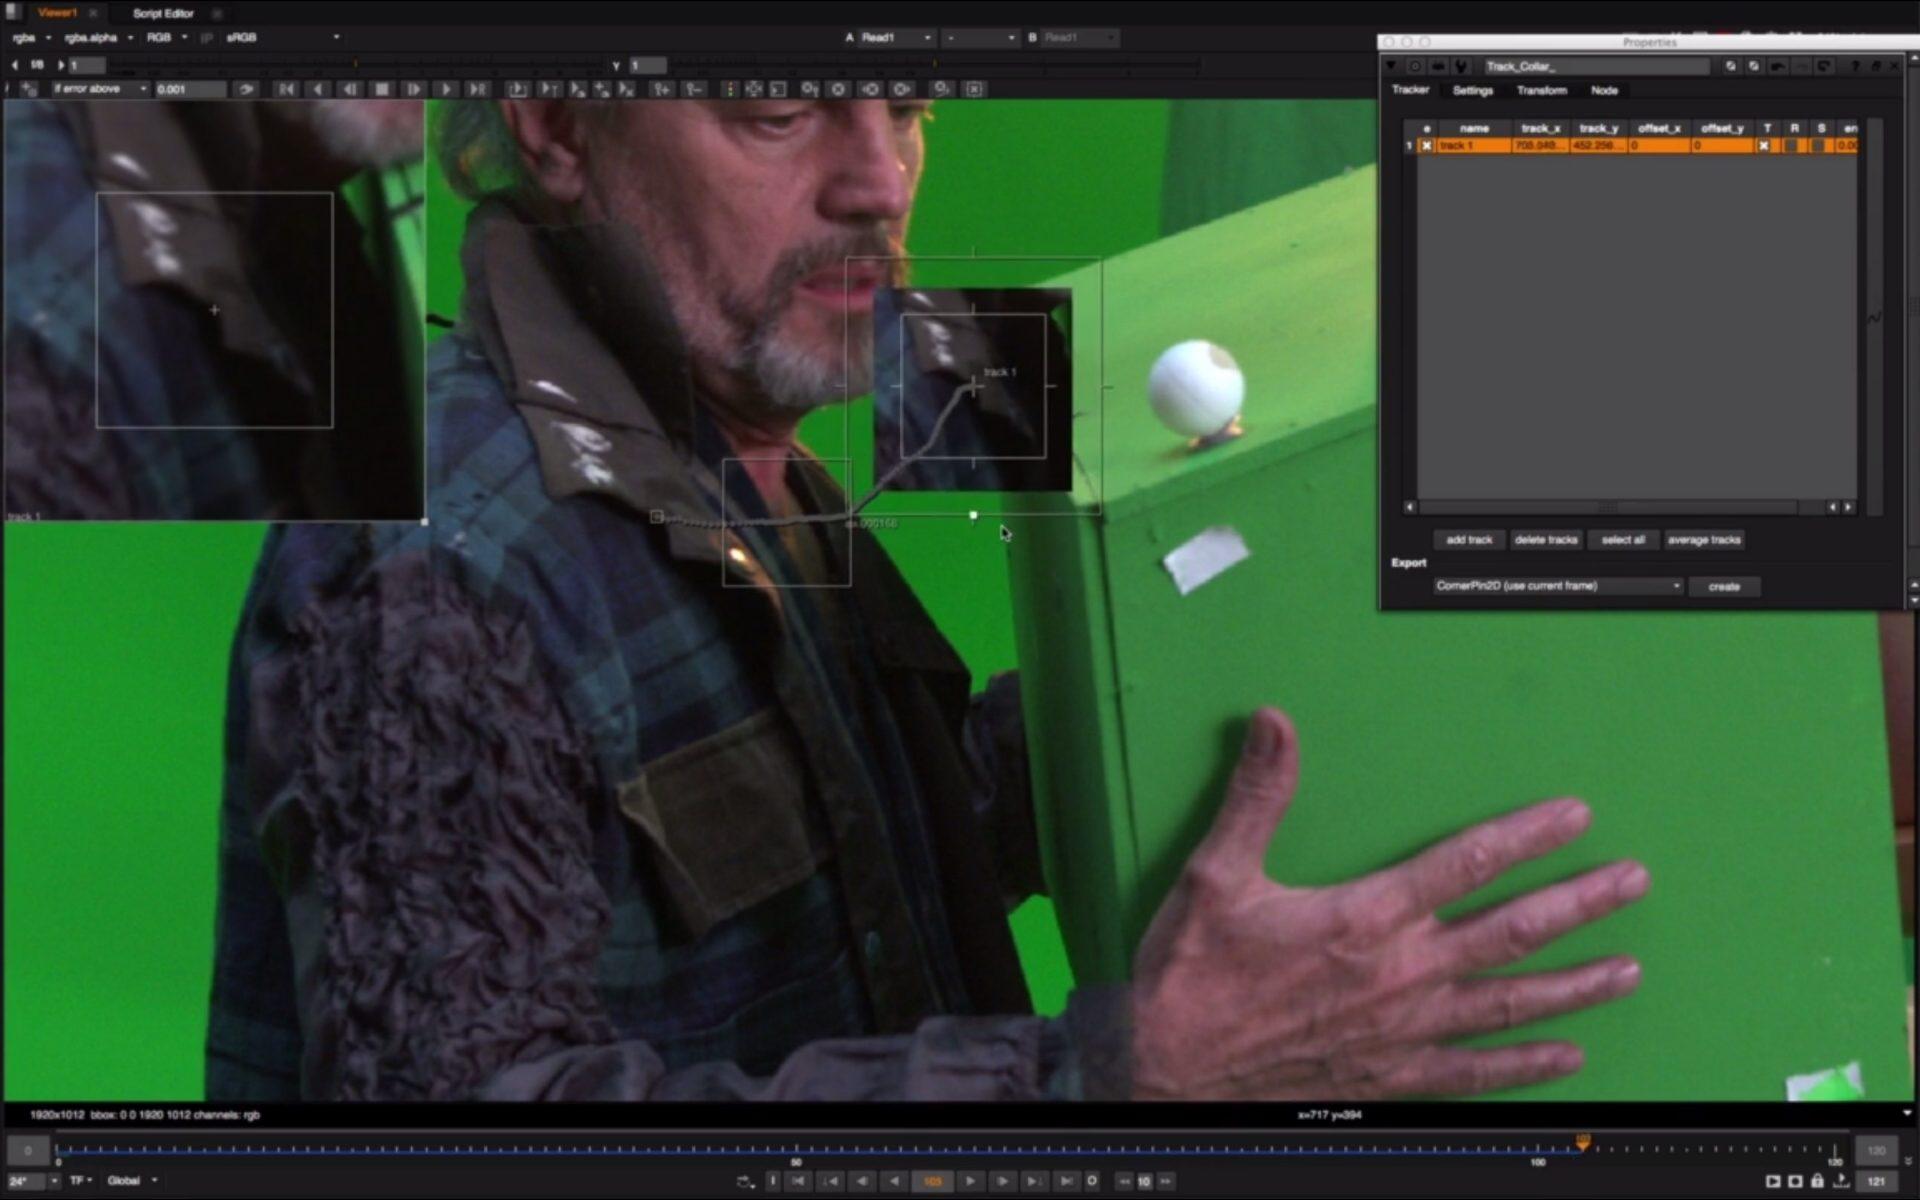 Nuke RotoPaint: Output paint strokesNuke RotoPaint: Output paint strokes